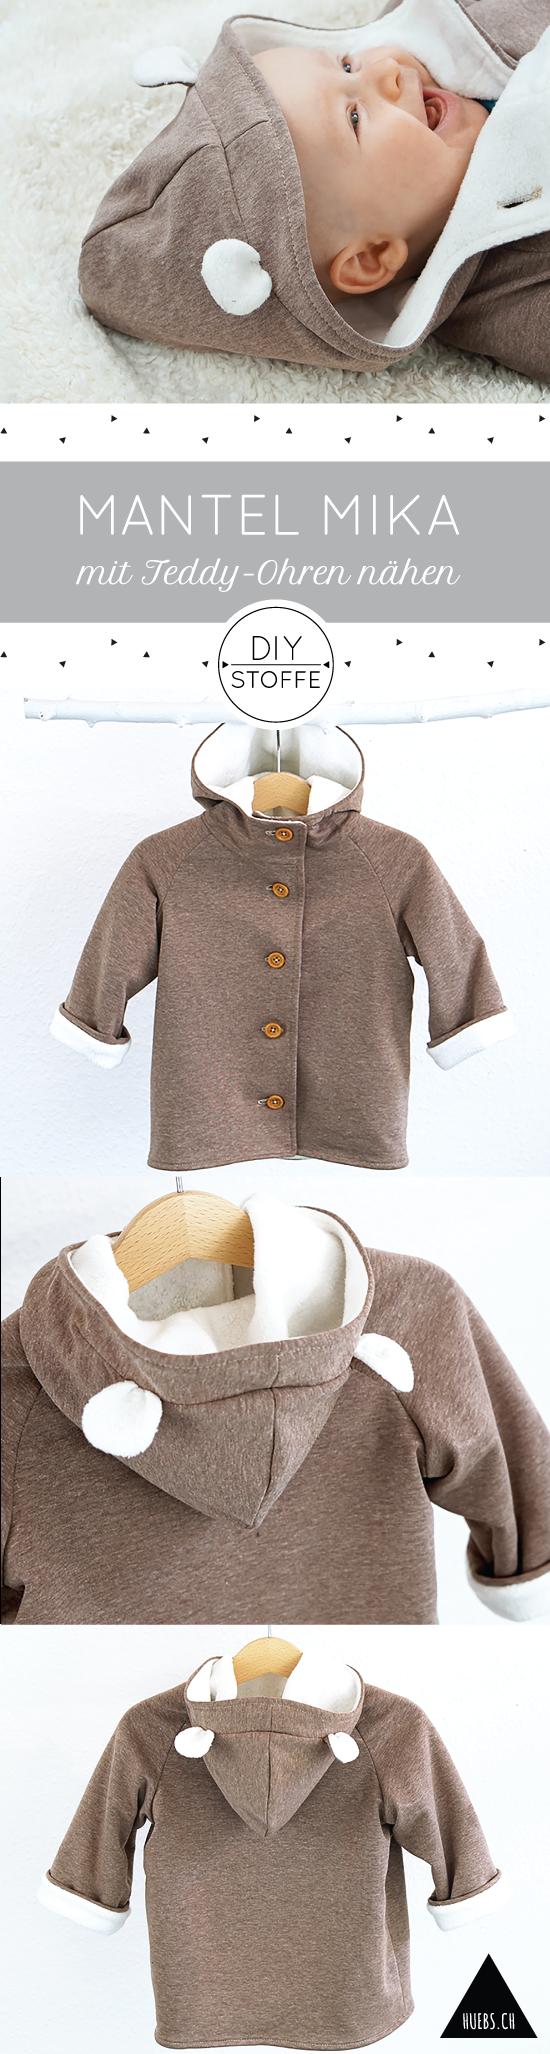 Mantel Mika – Anleitung & Schnittmuster #crochetdinosaurpatterns